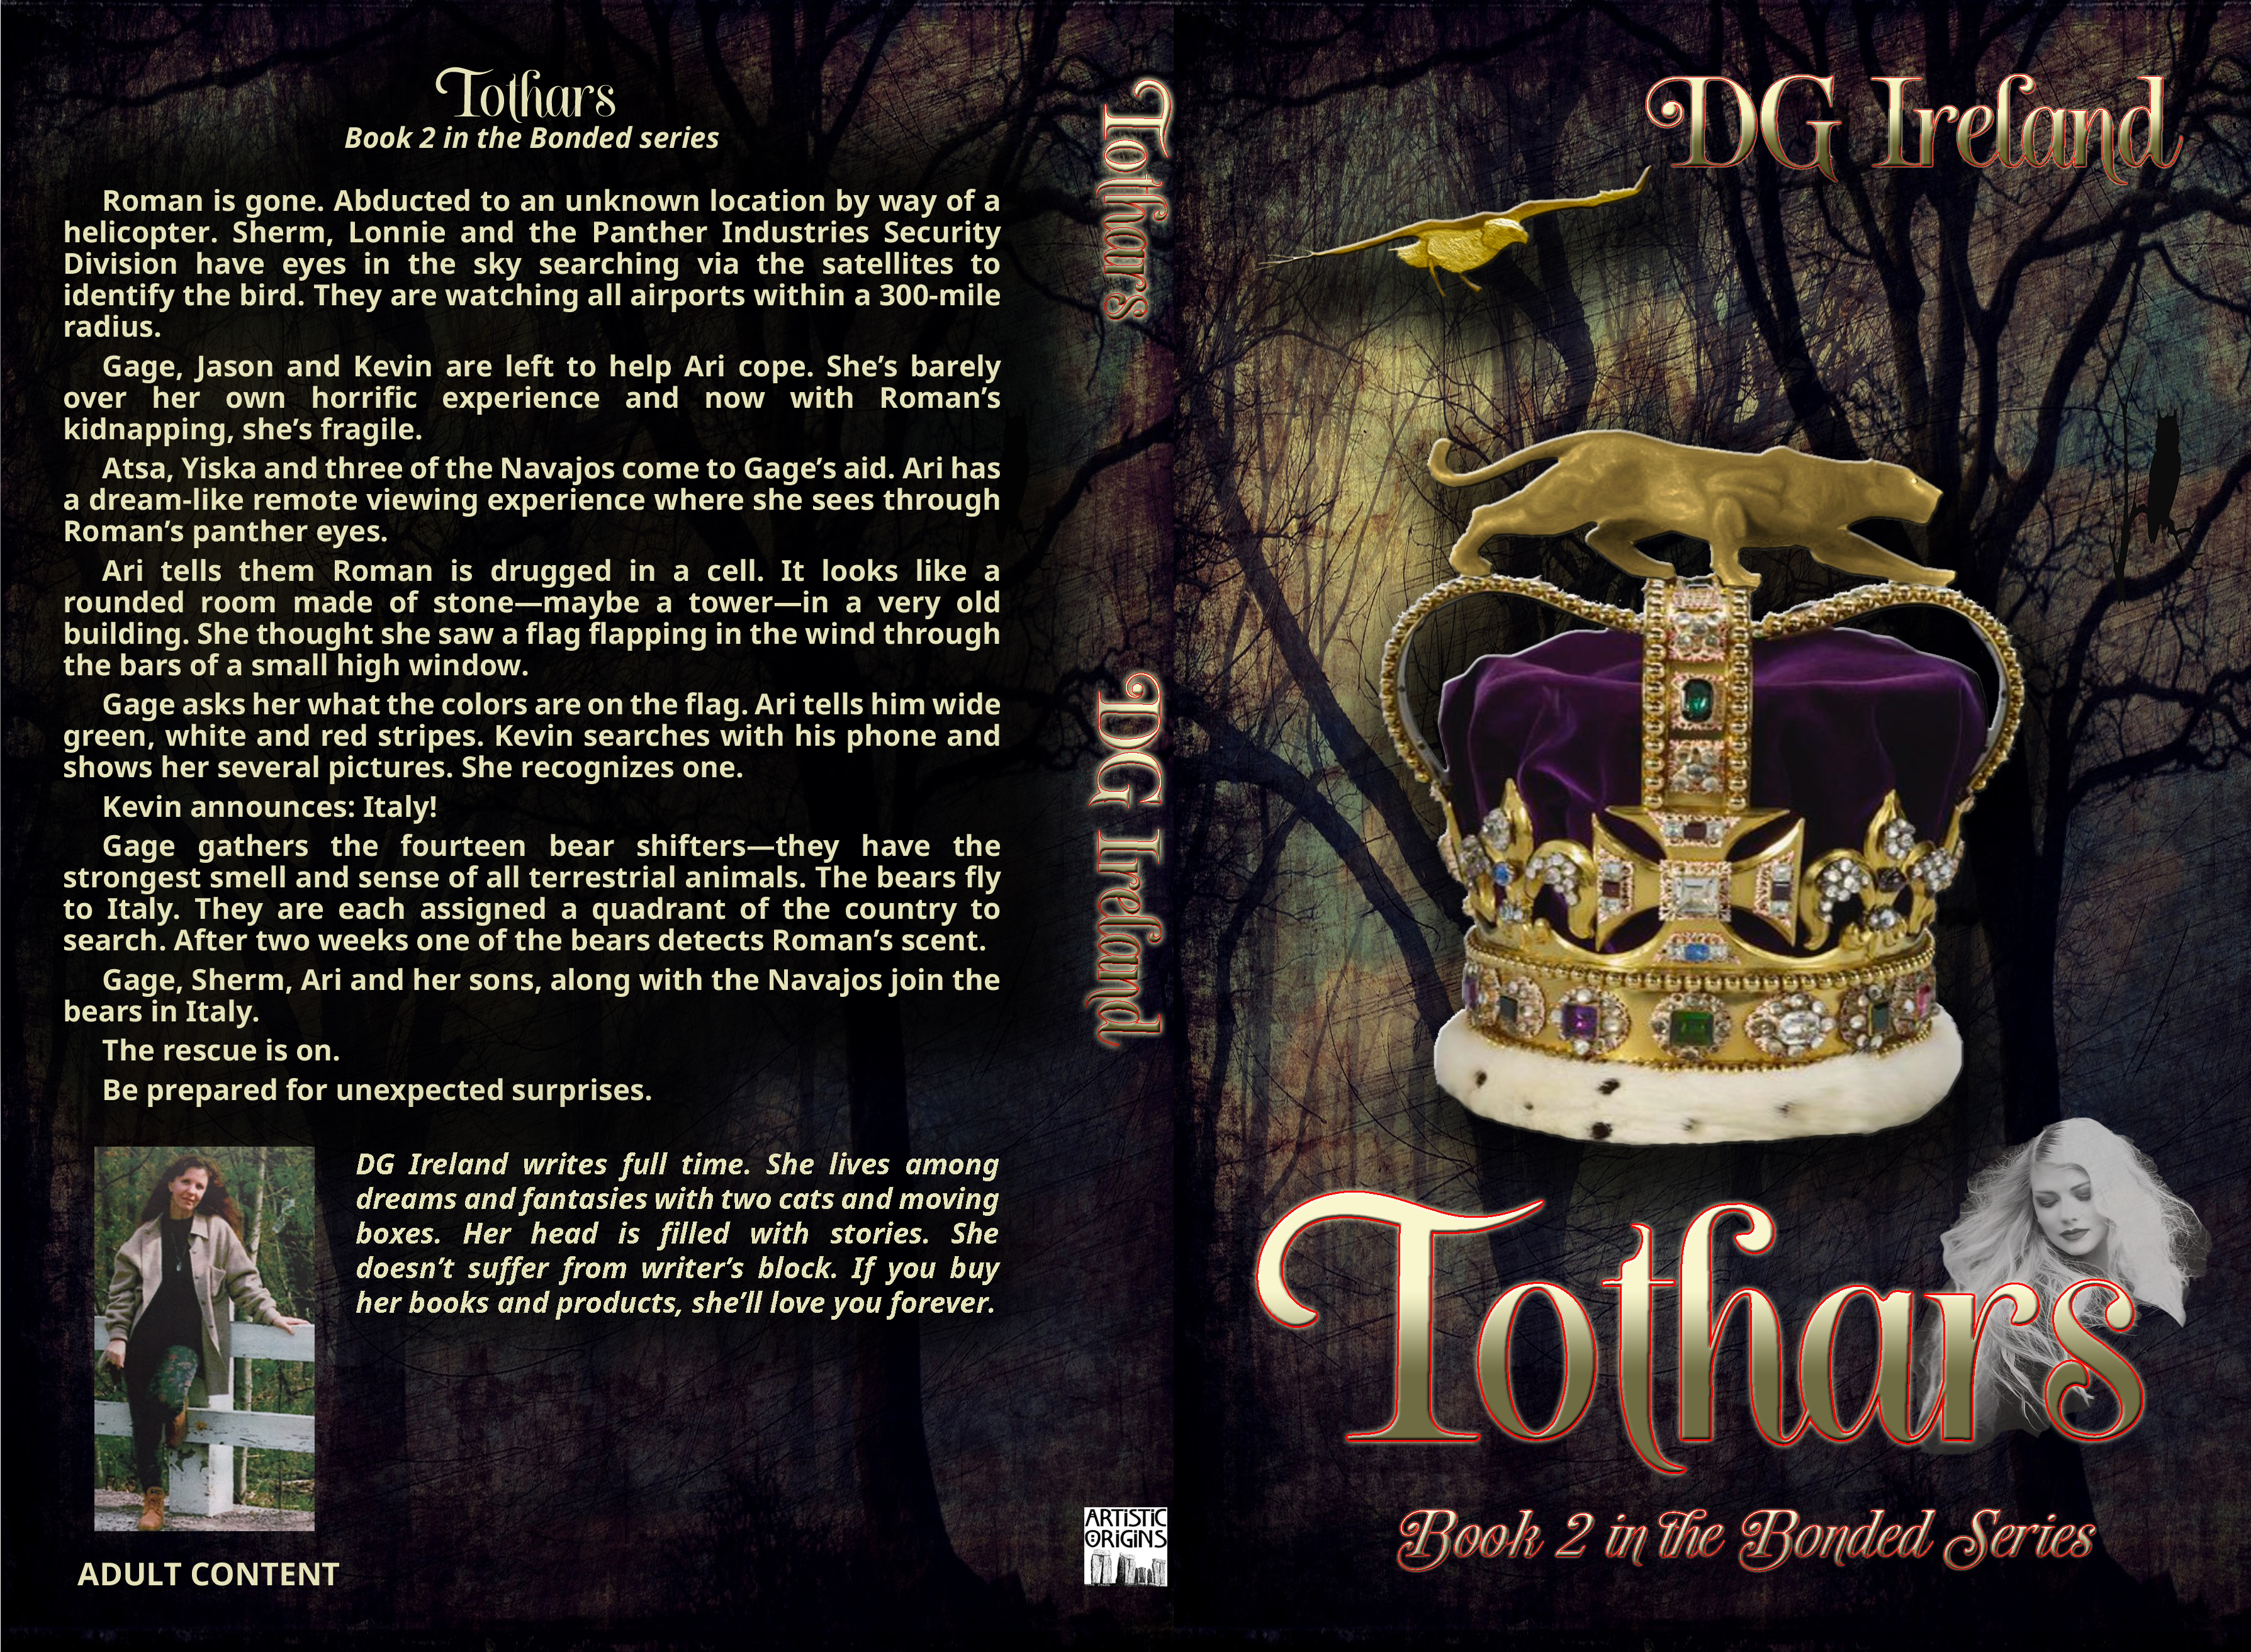 Totharscover-Ari copy2